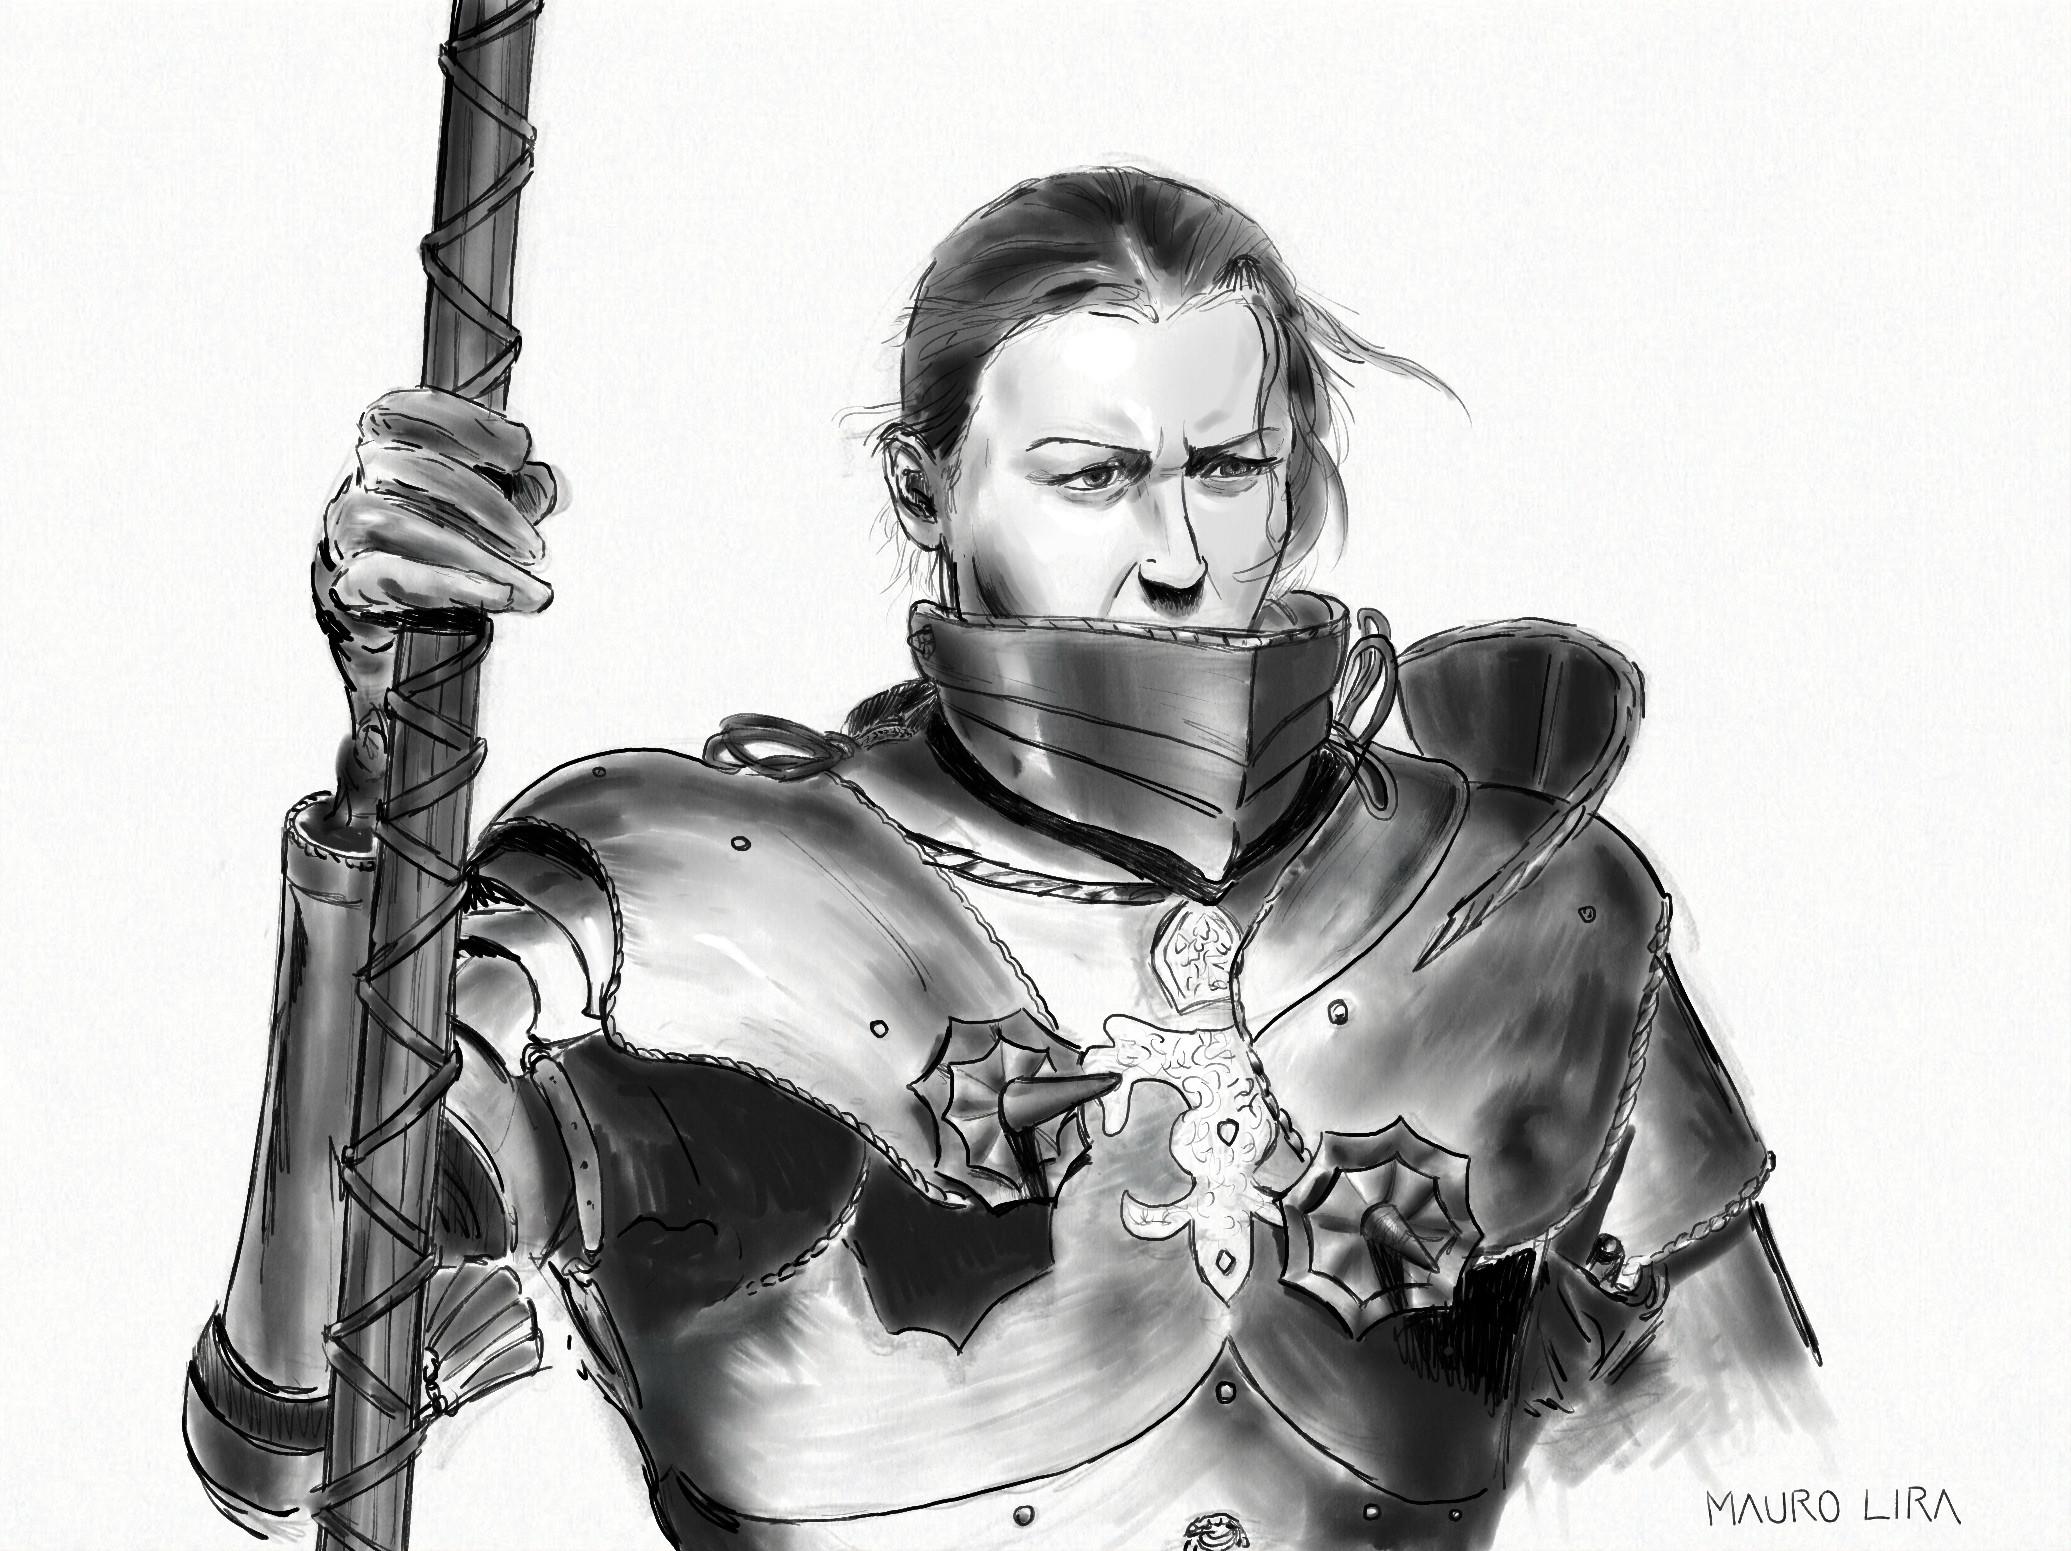 Day 14 armor